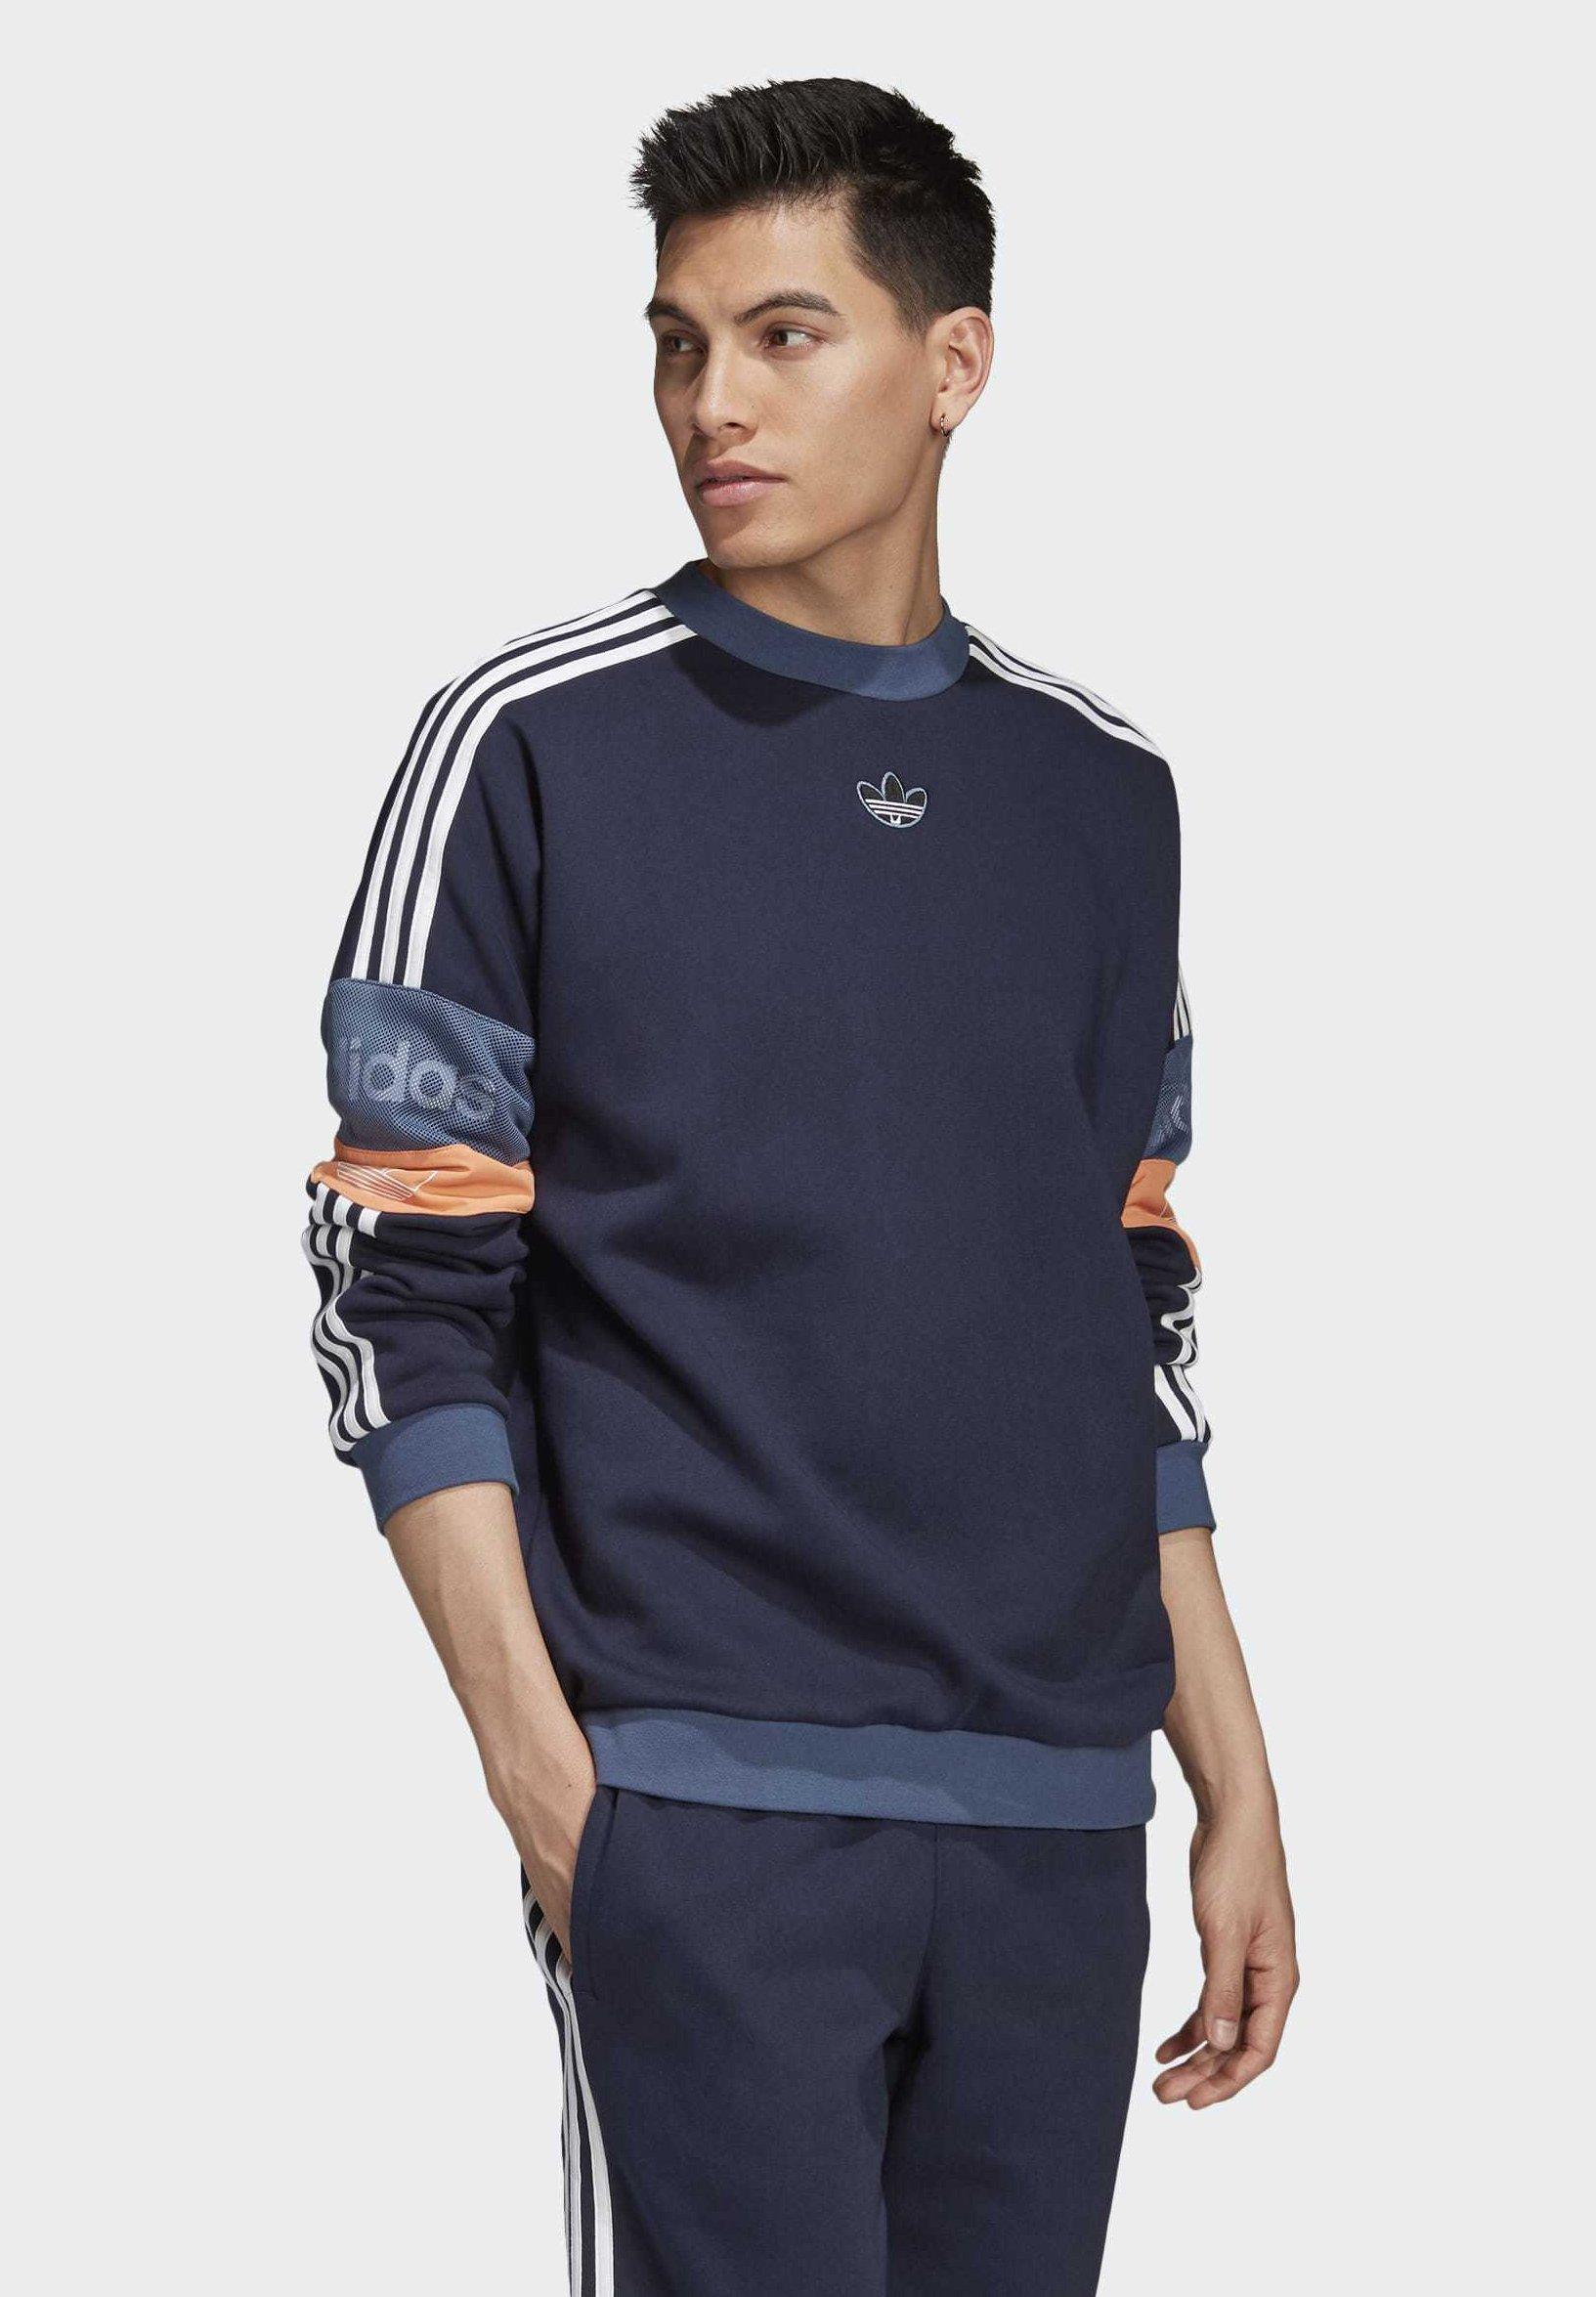 adidas Originals TS TREFOIL SWEATSHIRT Sweatshirt blue